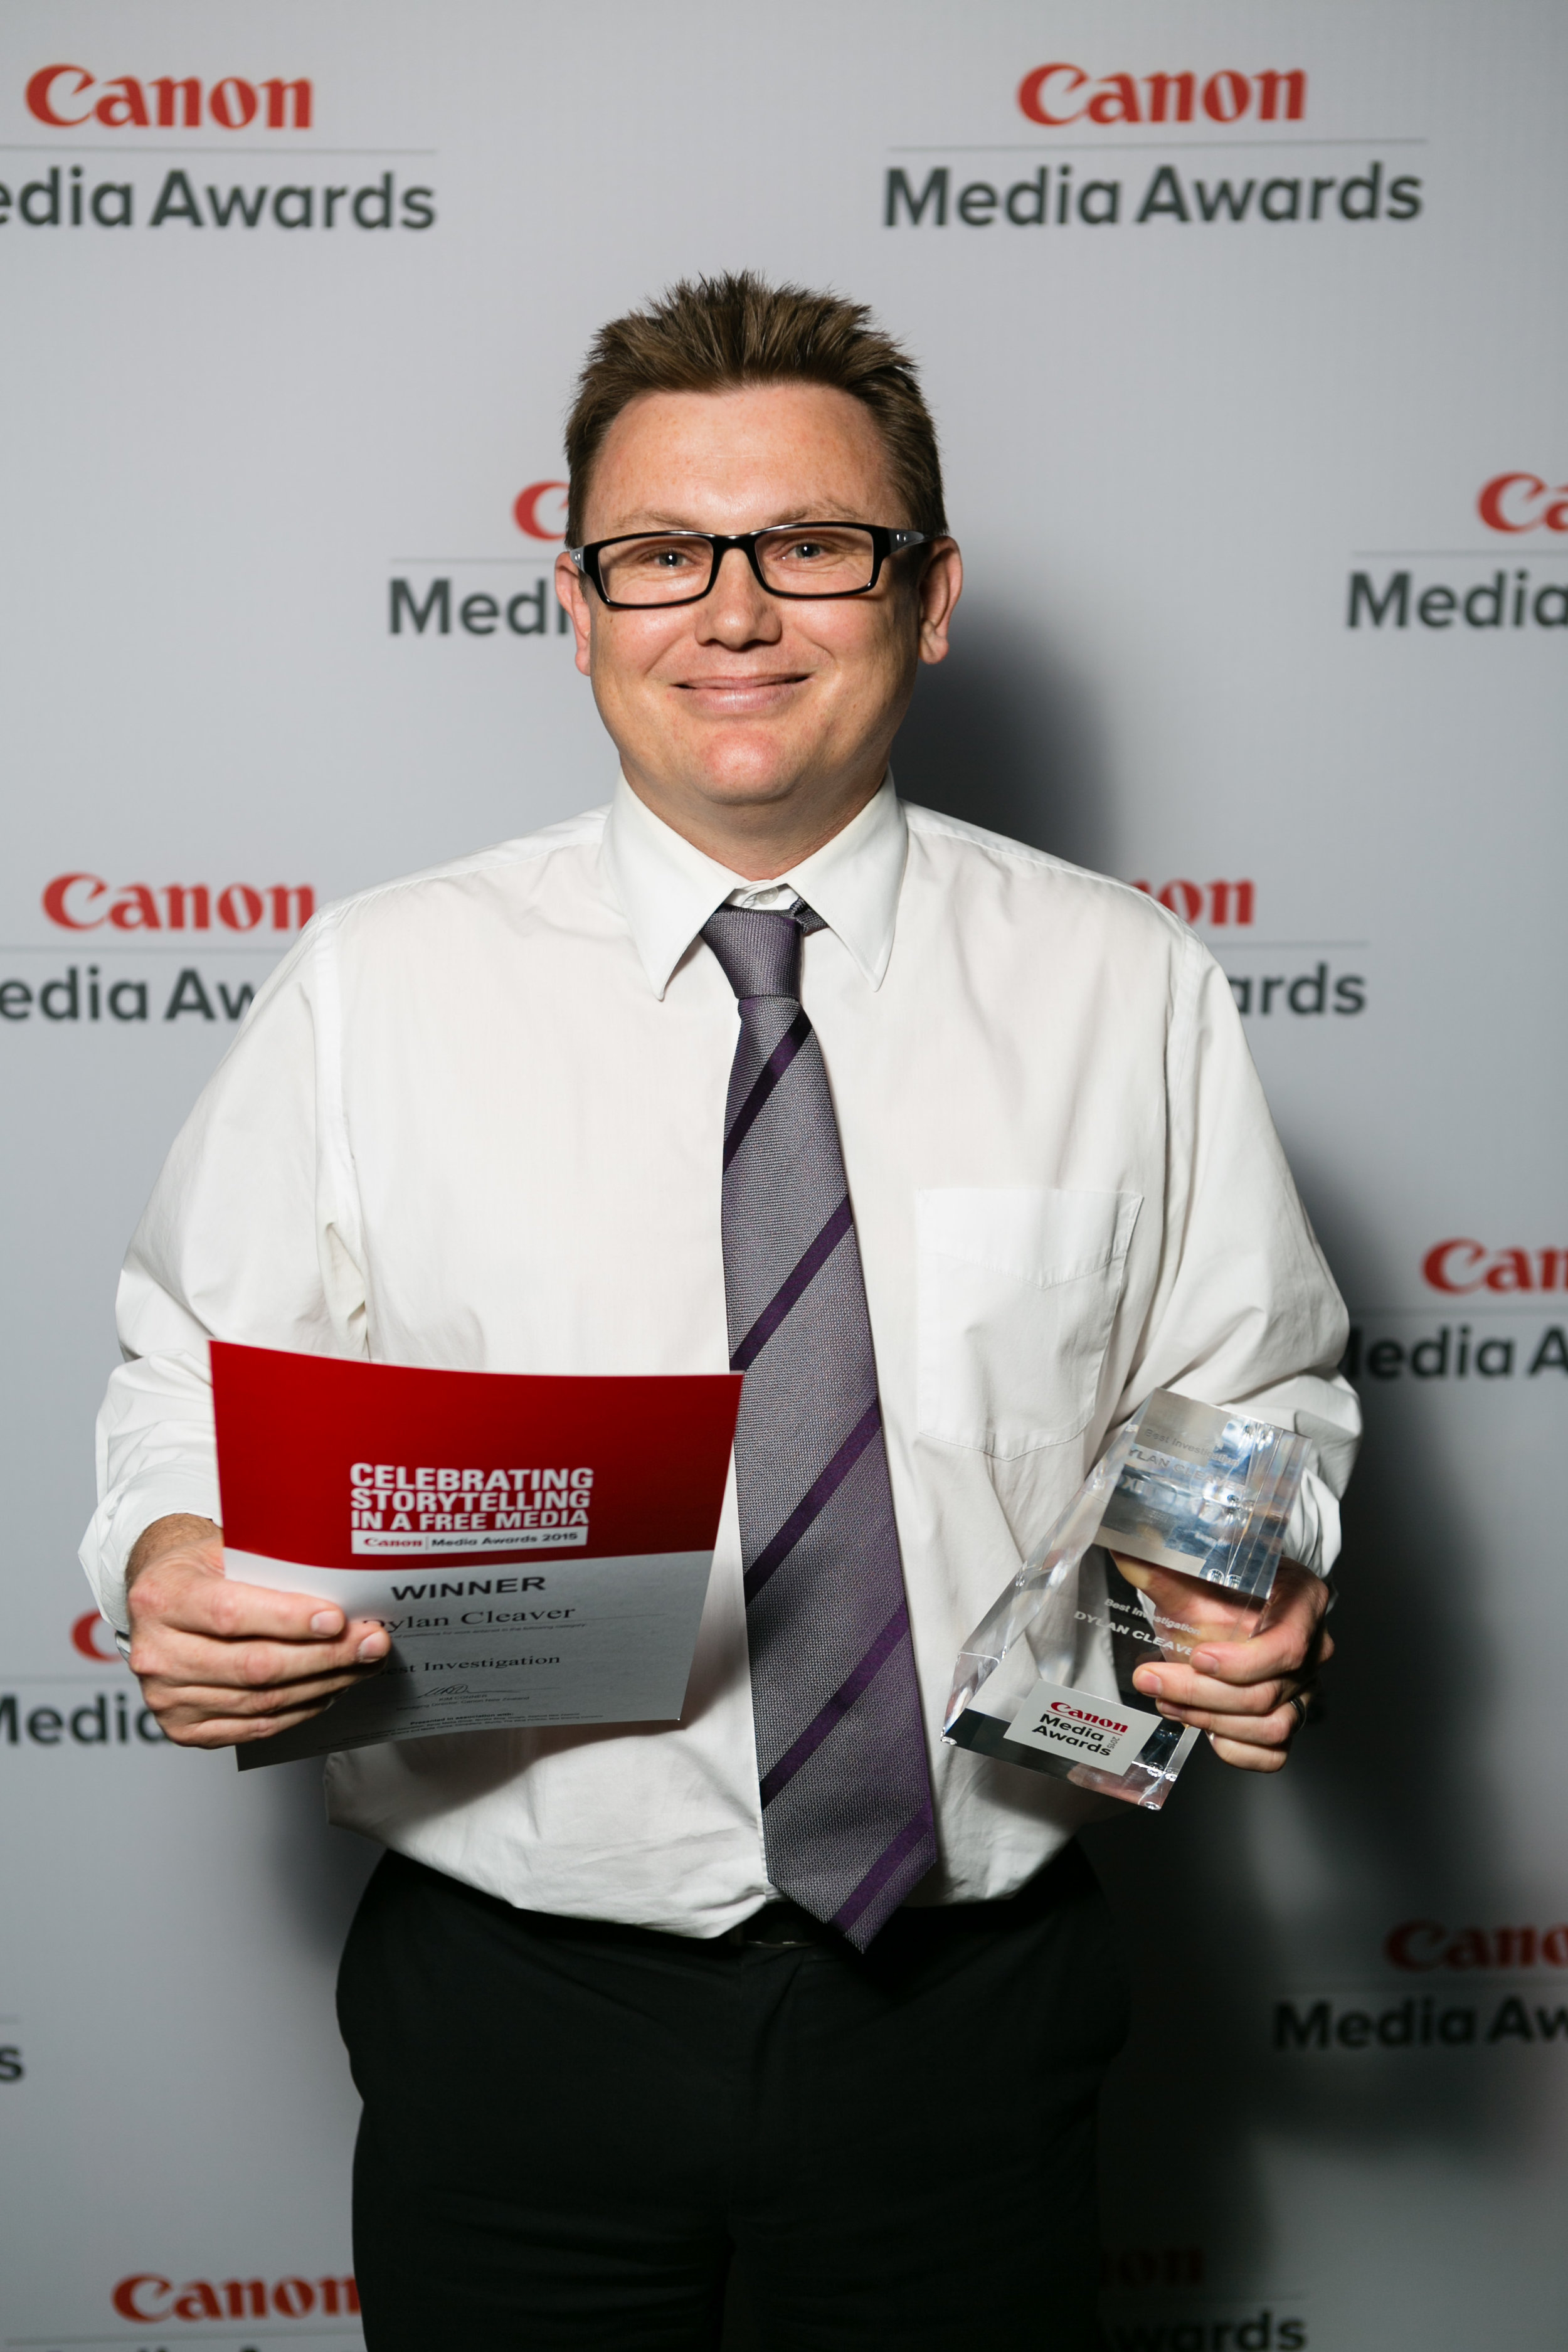 canon_media_awards_2015_interlike_nz_clinton_tudor-5881-172.jpg